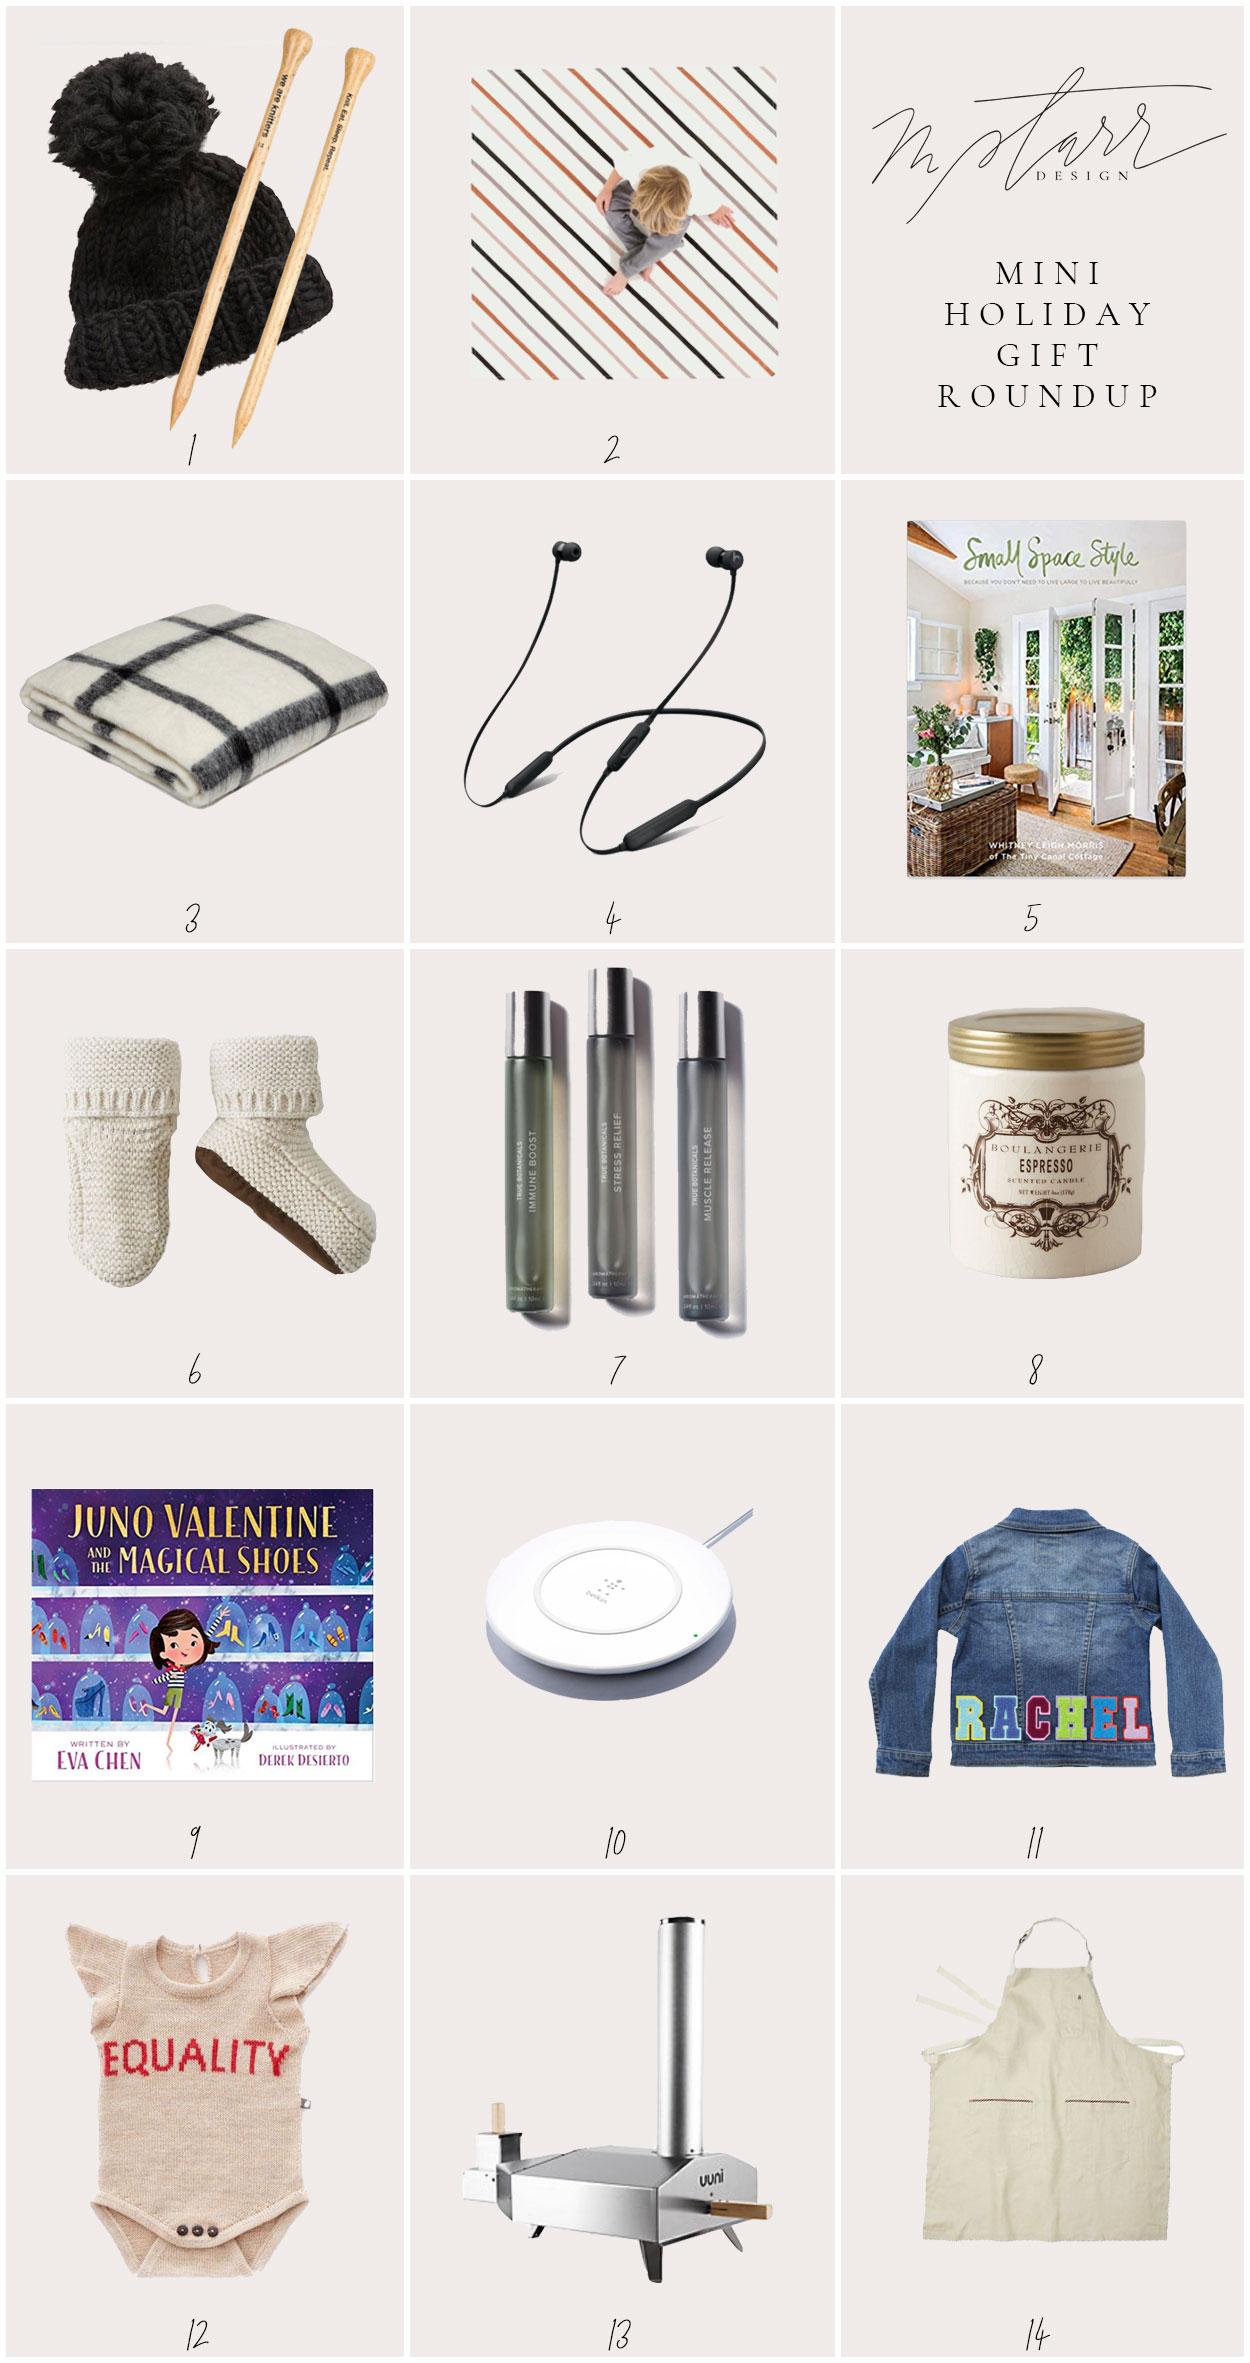 mini_holiday_gift_roundup_mStarr.jpg